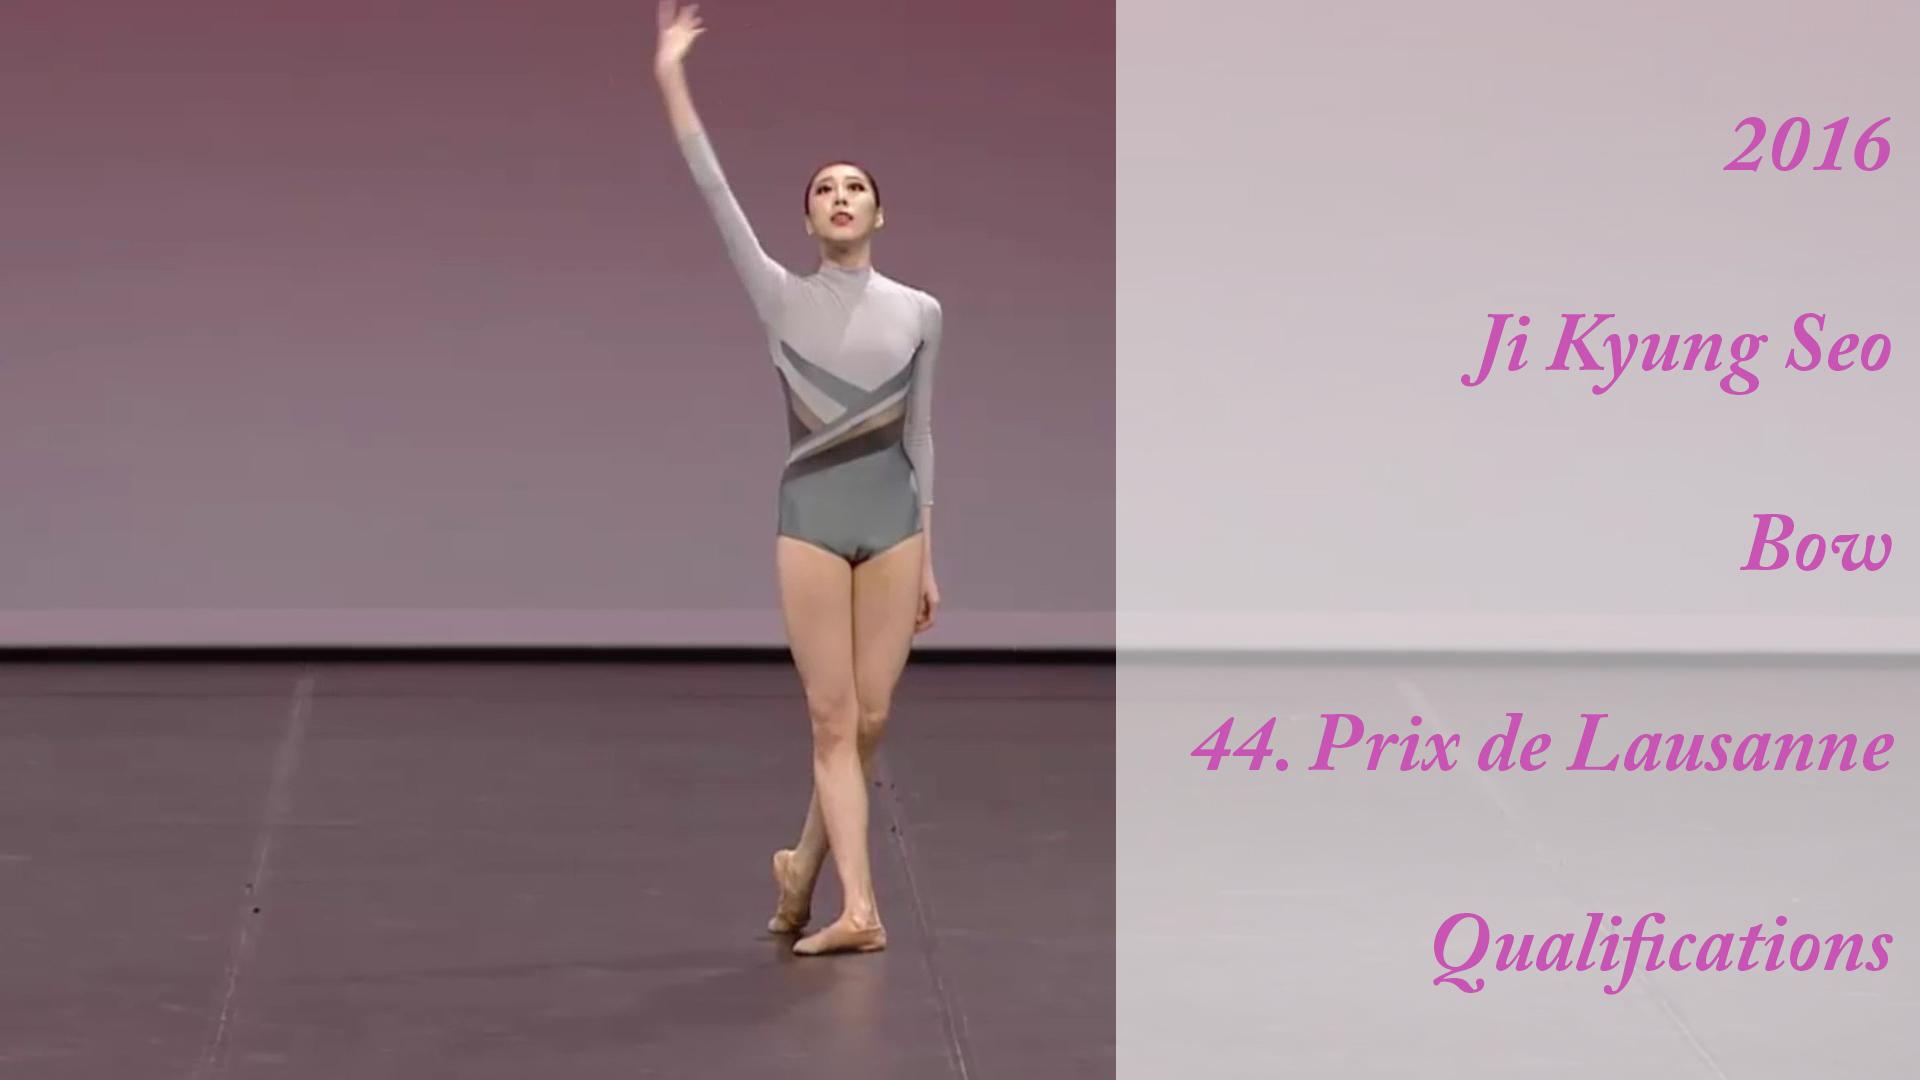 2016 – Ji Kyung Seo – Bow – 44. Prix de Lausanne – Qualifications